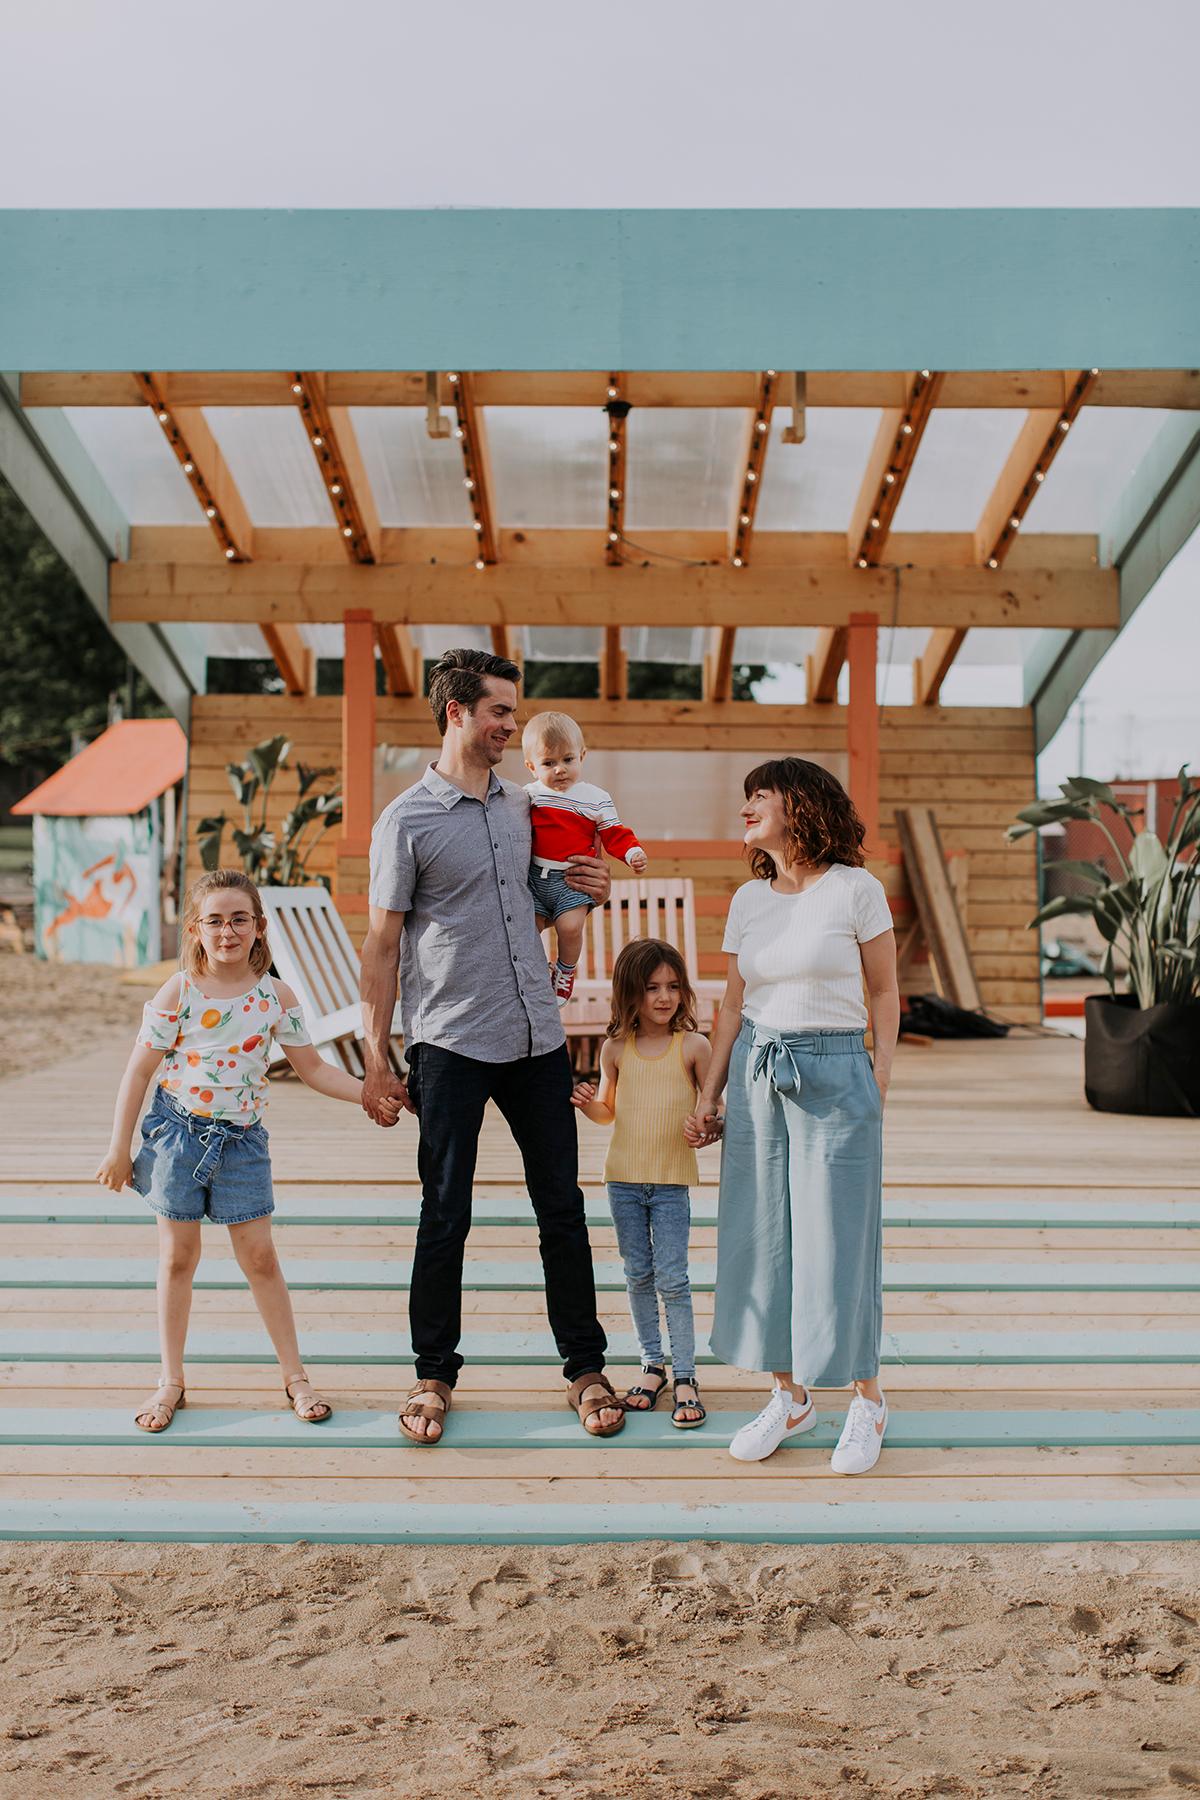 Famille_Caroline-50 copie.jpg